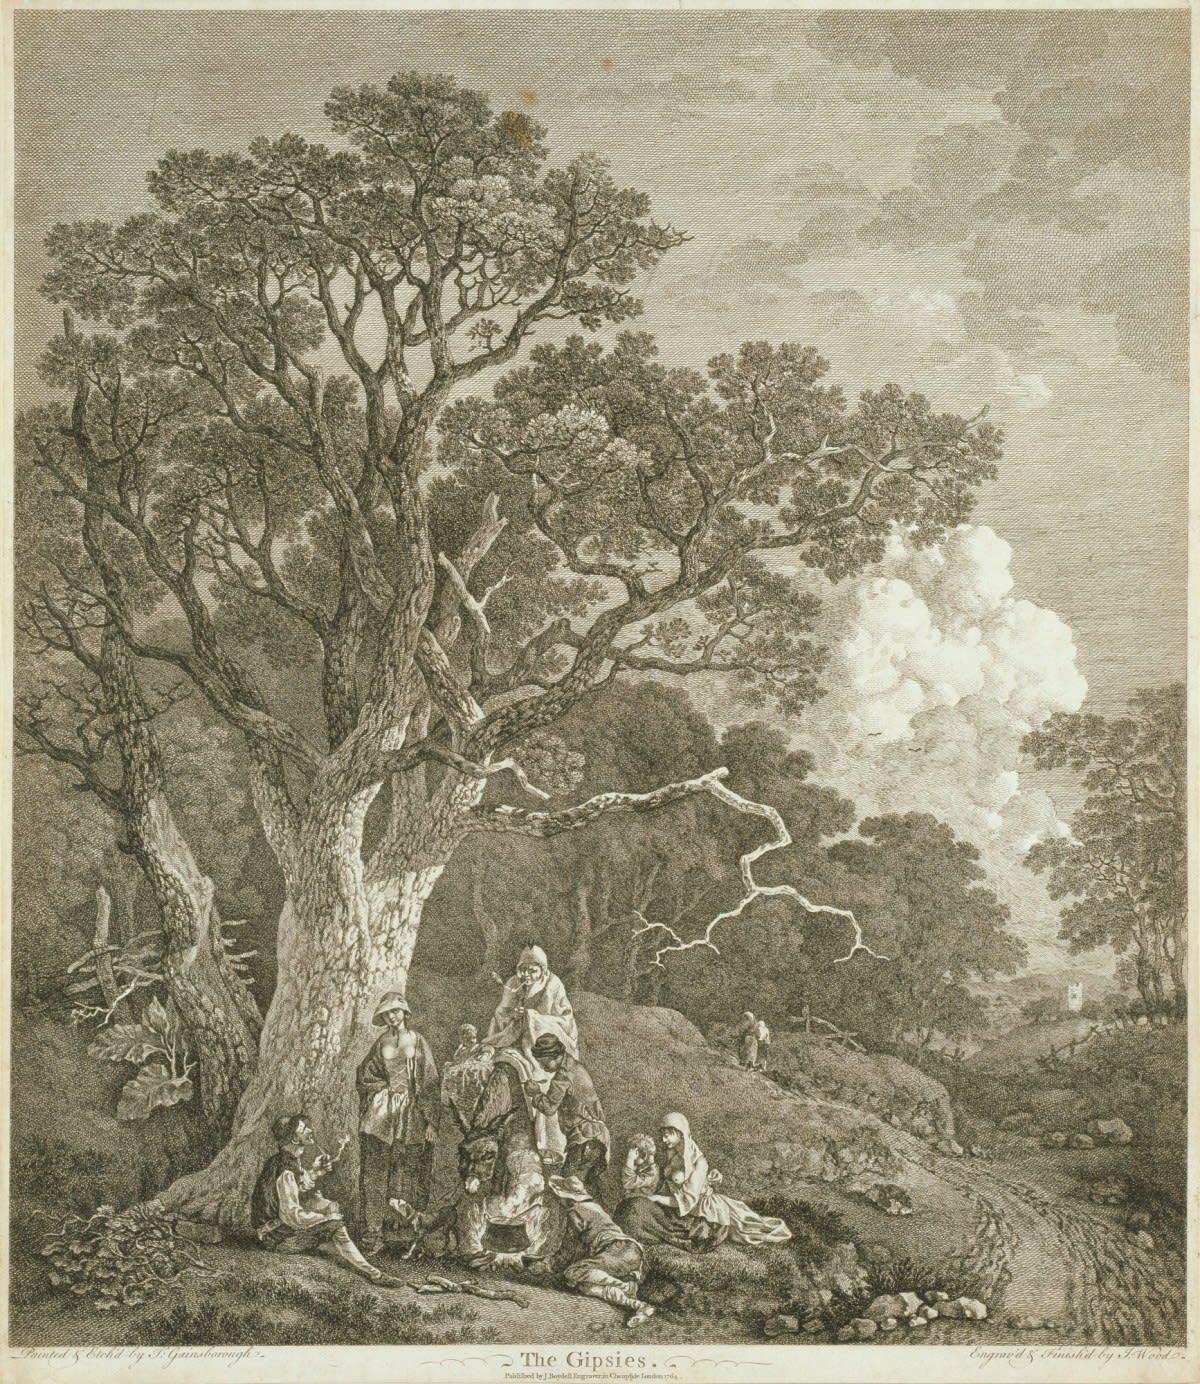 Thomas Gainsborough, The Gypsies, c.1724 Etching © Royal Academy of Arts